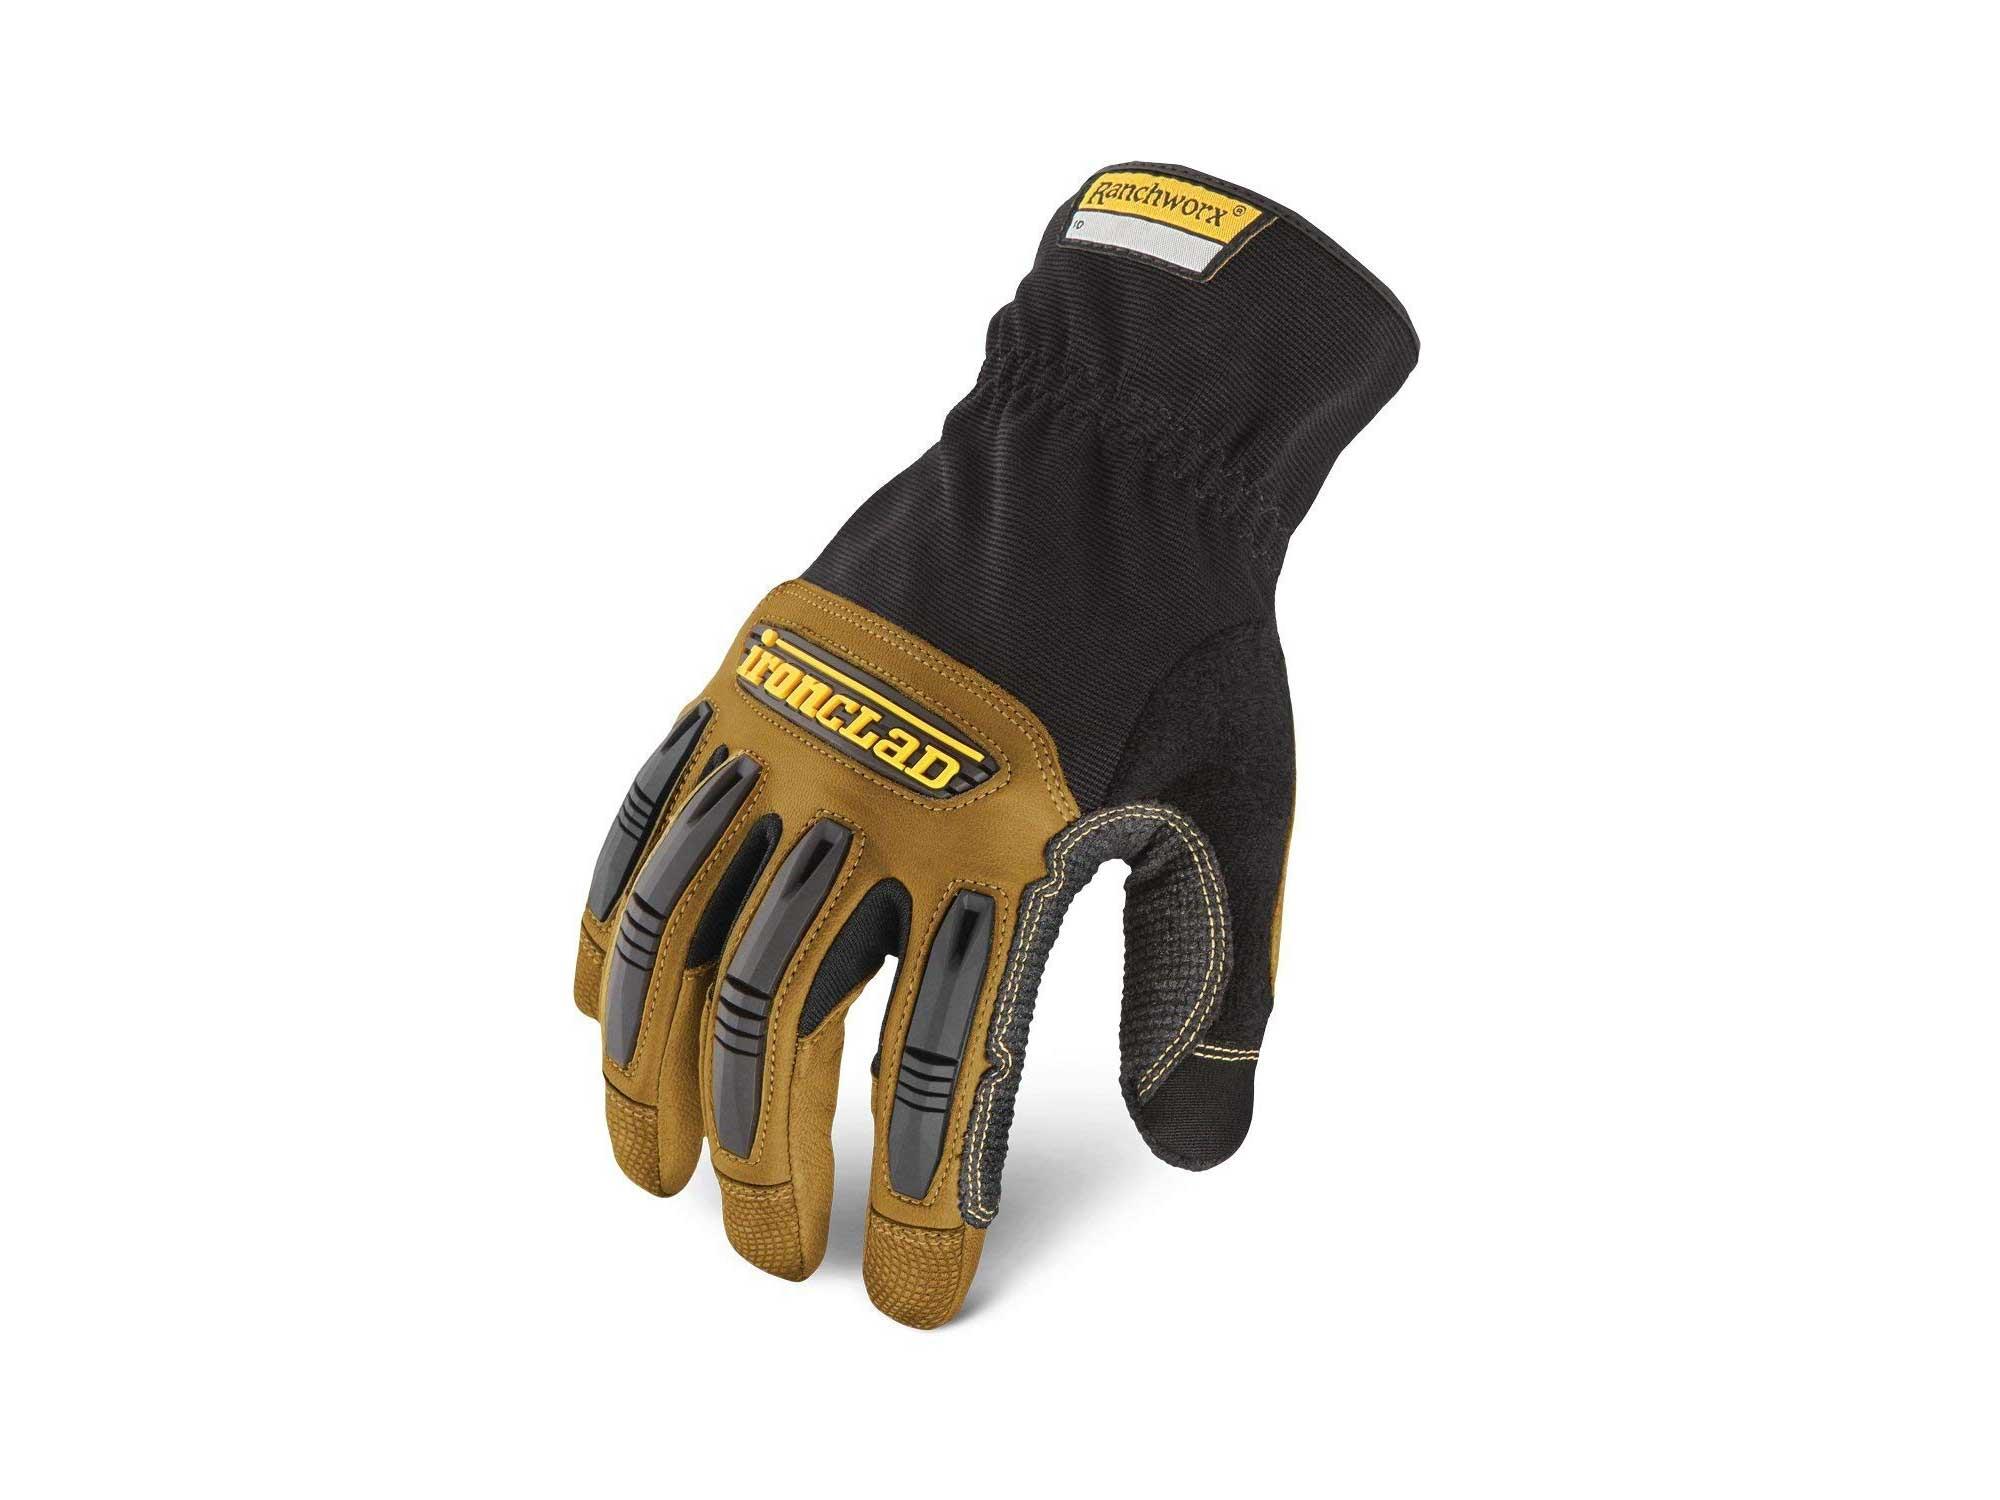 Ironclad work glove